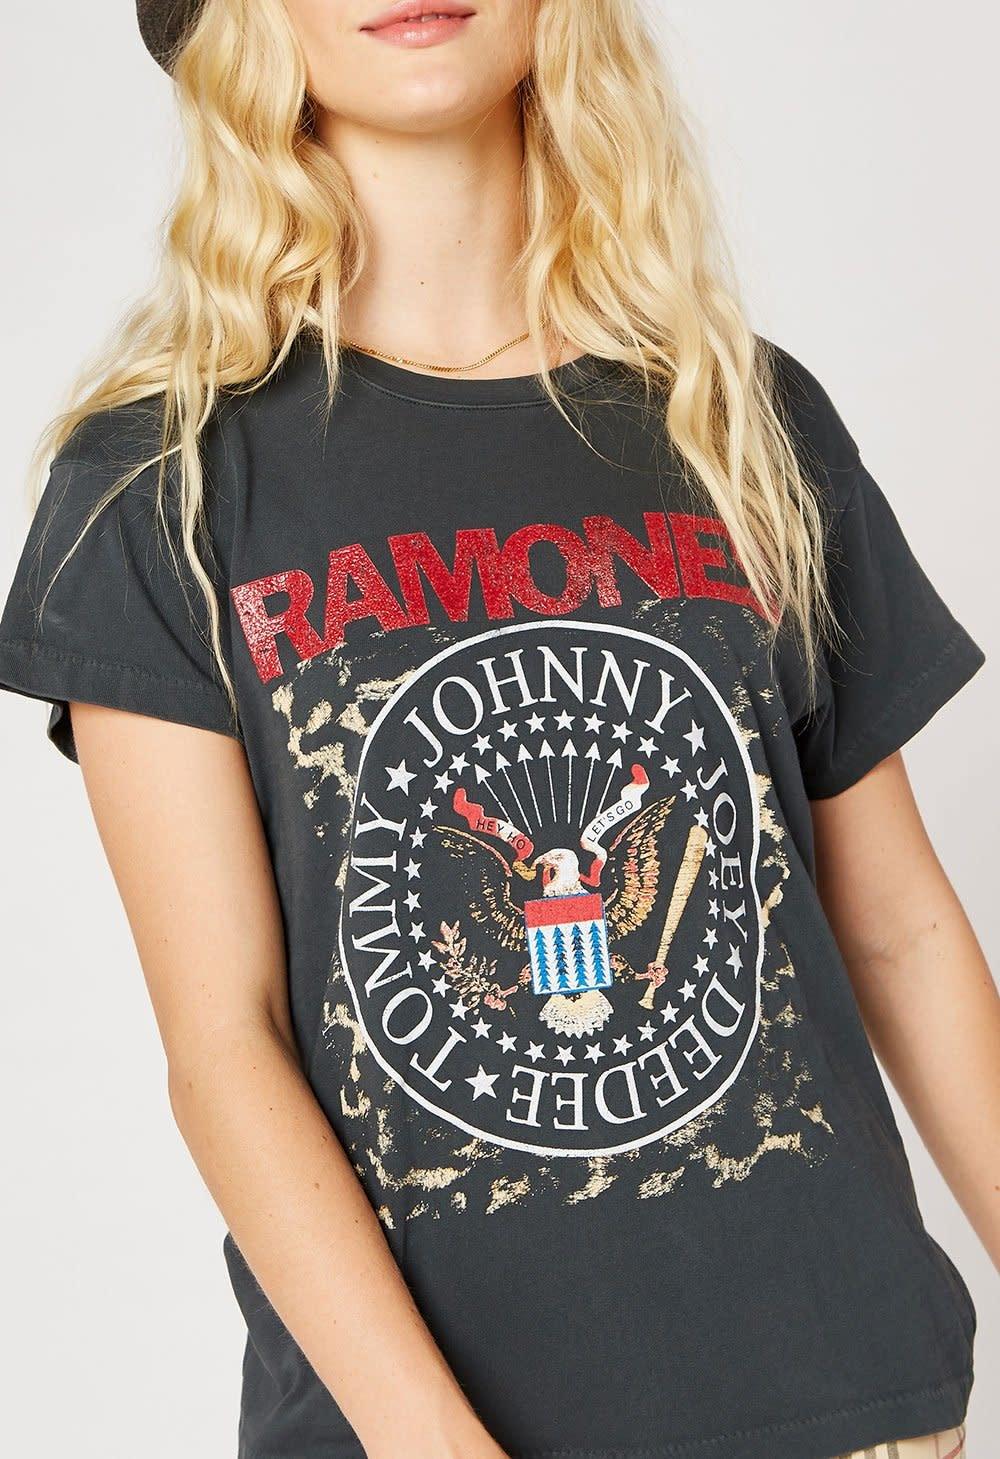 Atikshop Ramones Leopard Crest Tour Tee